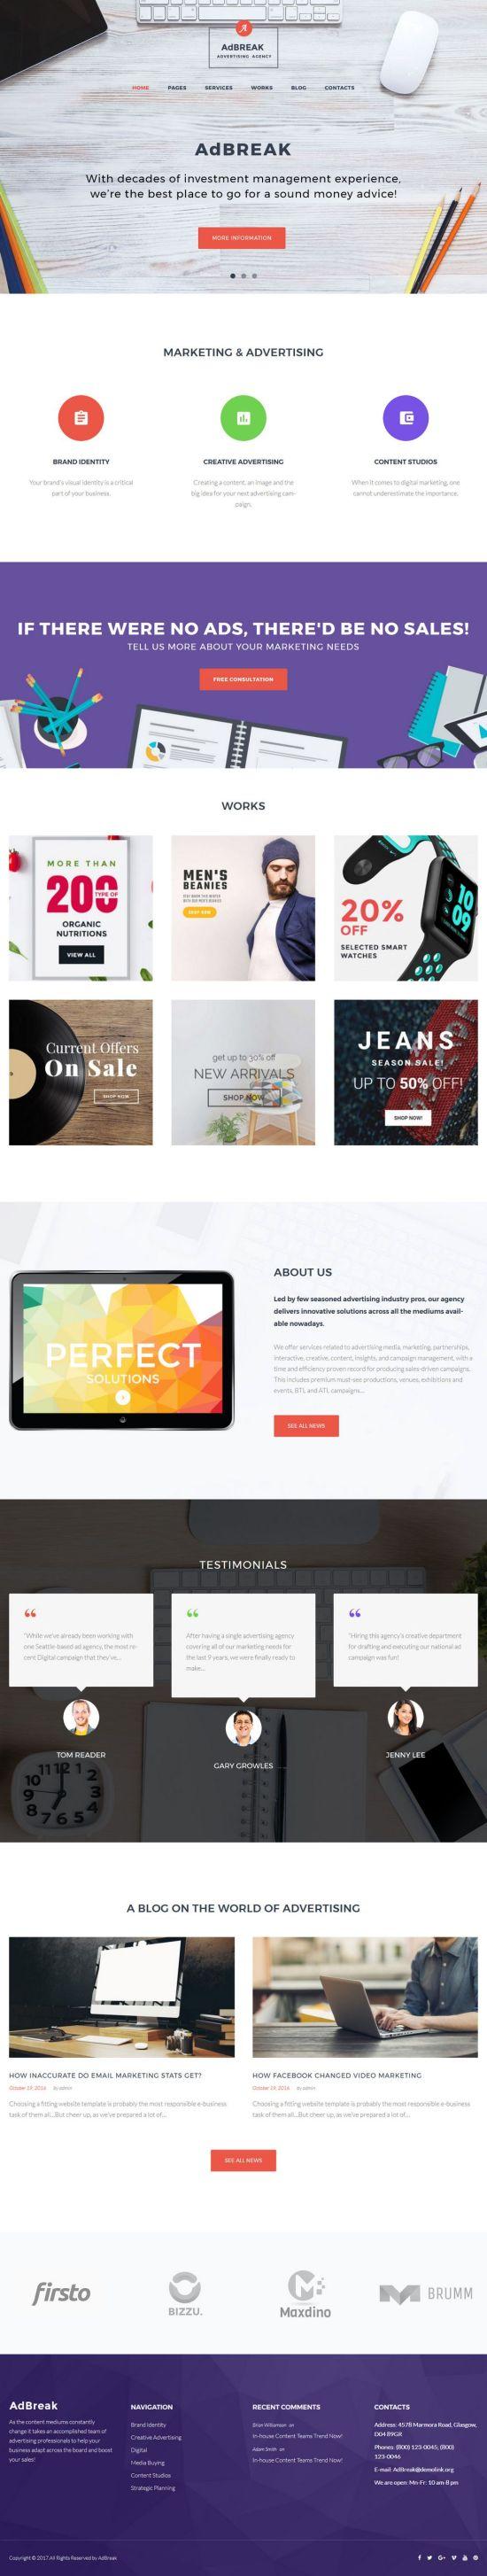 adbreak template monster wordpress theme 01 - AdBreak WordPress Theme